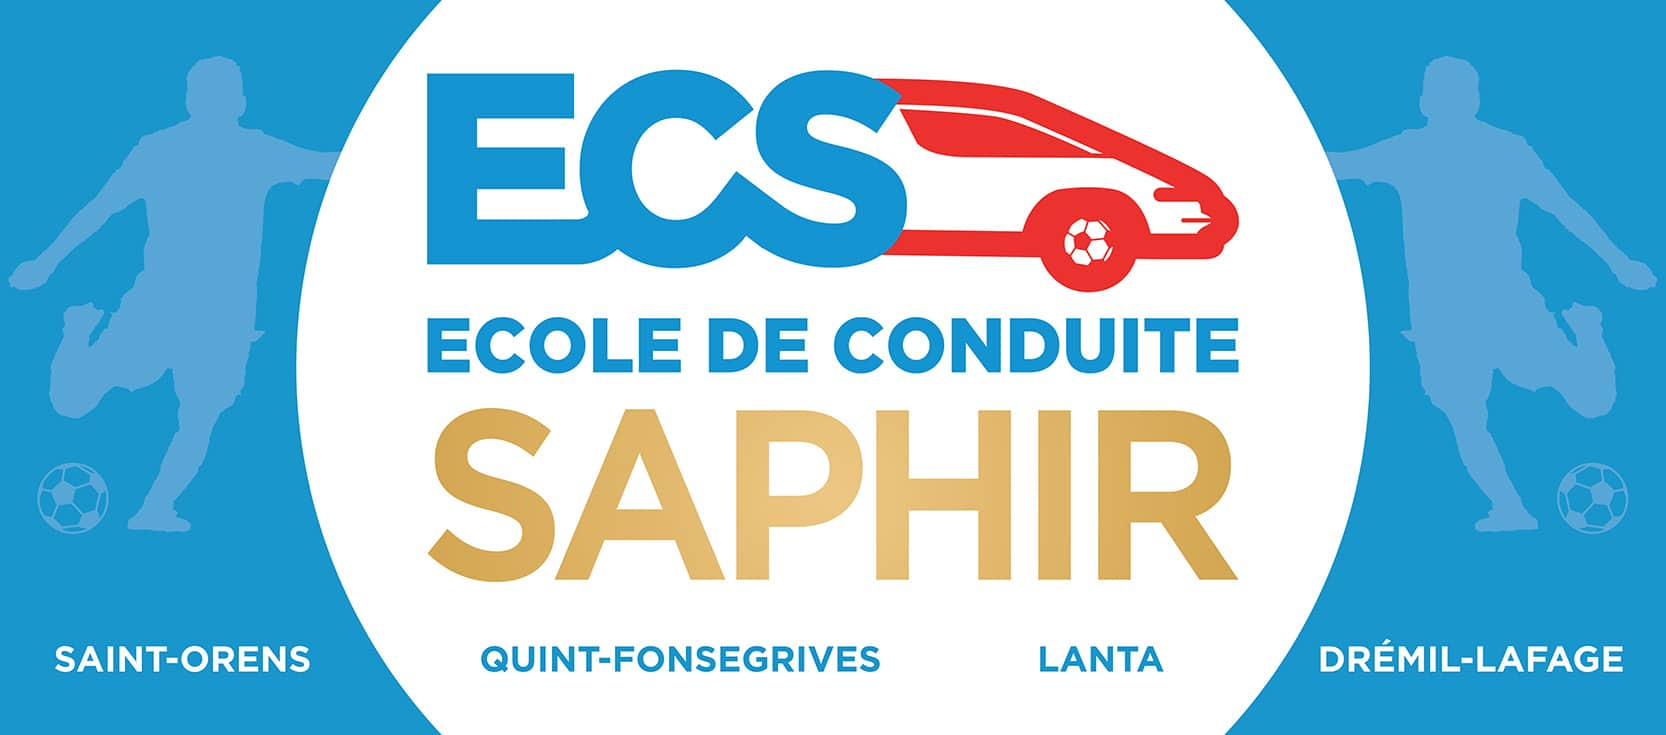 ECS St-Orens